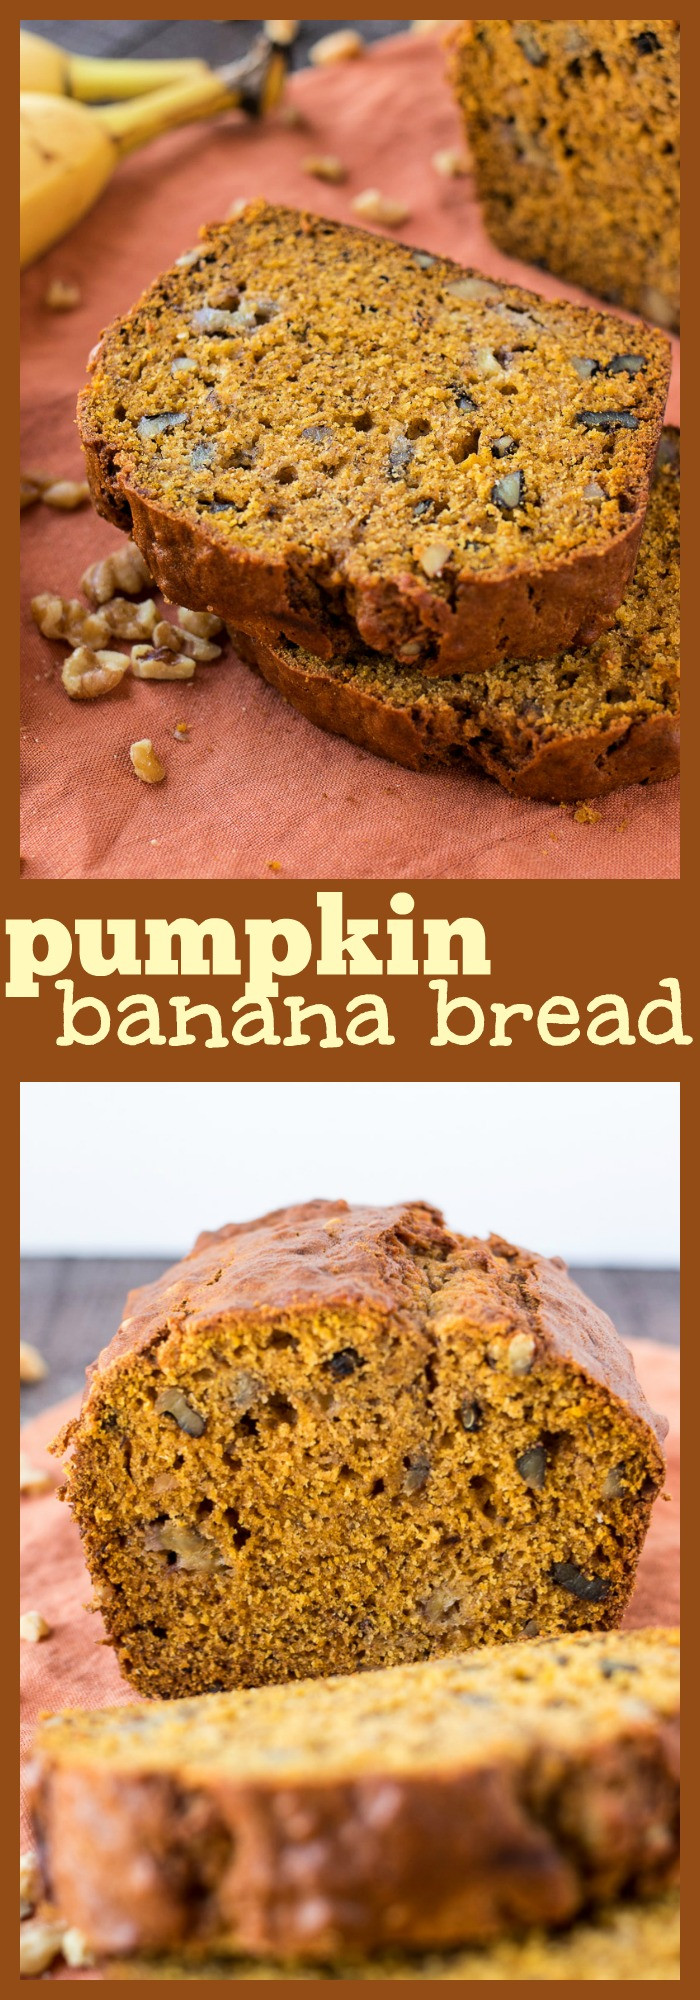 Pumpkin Banana Bread photo collage